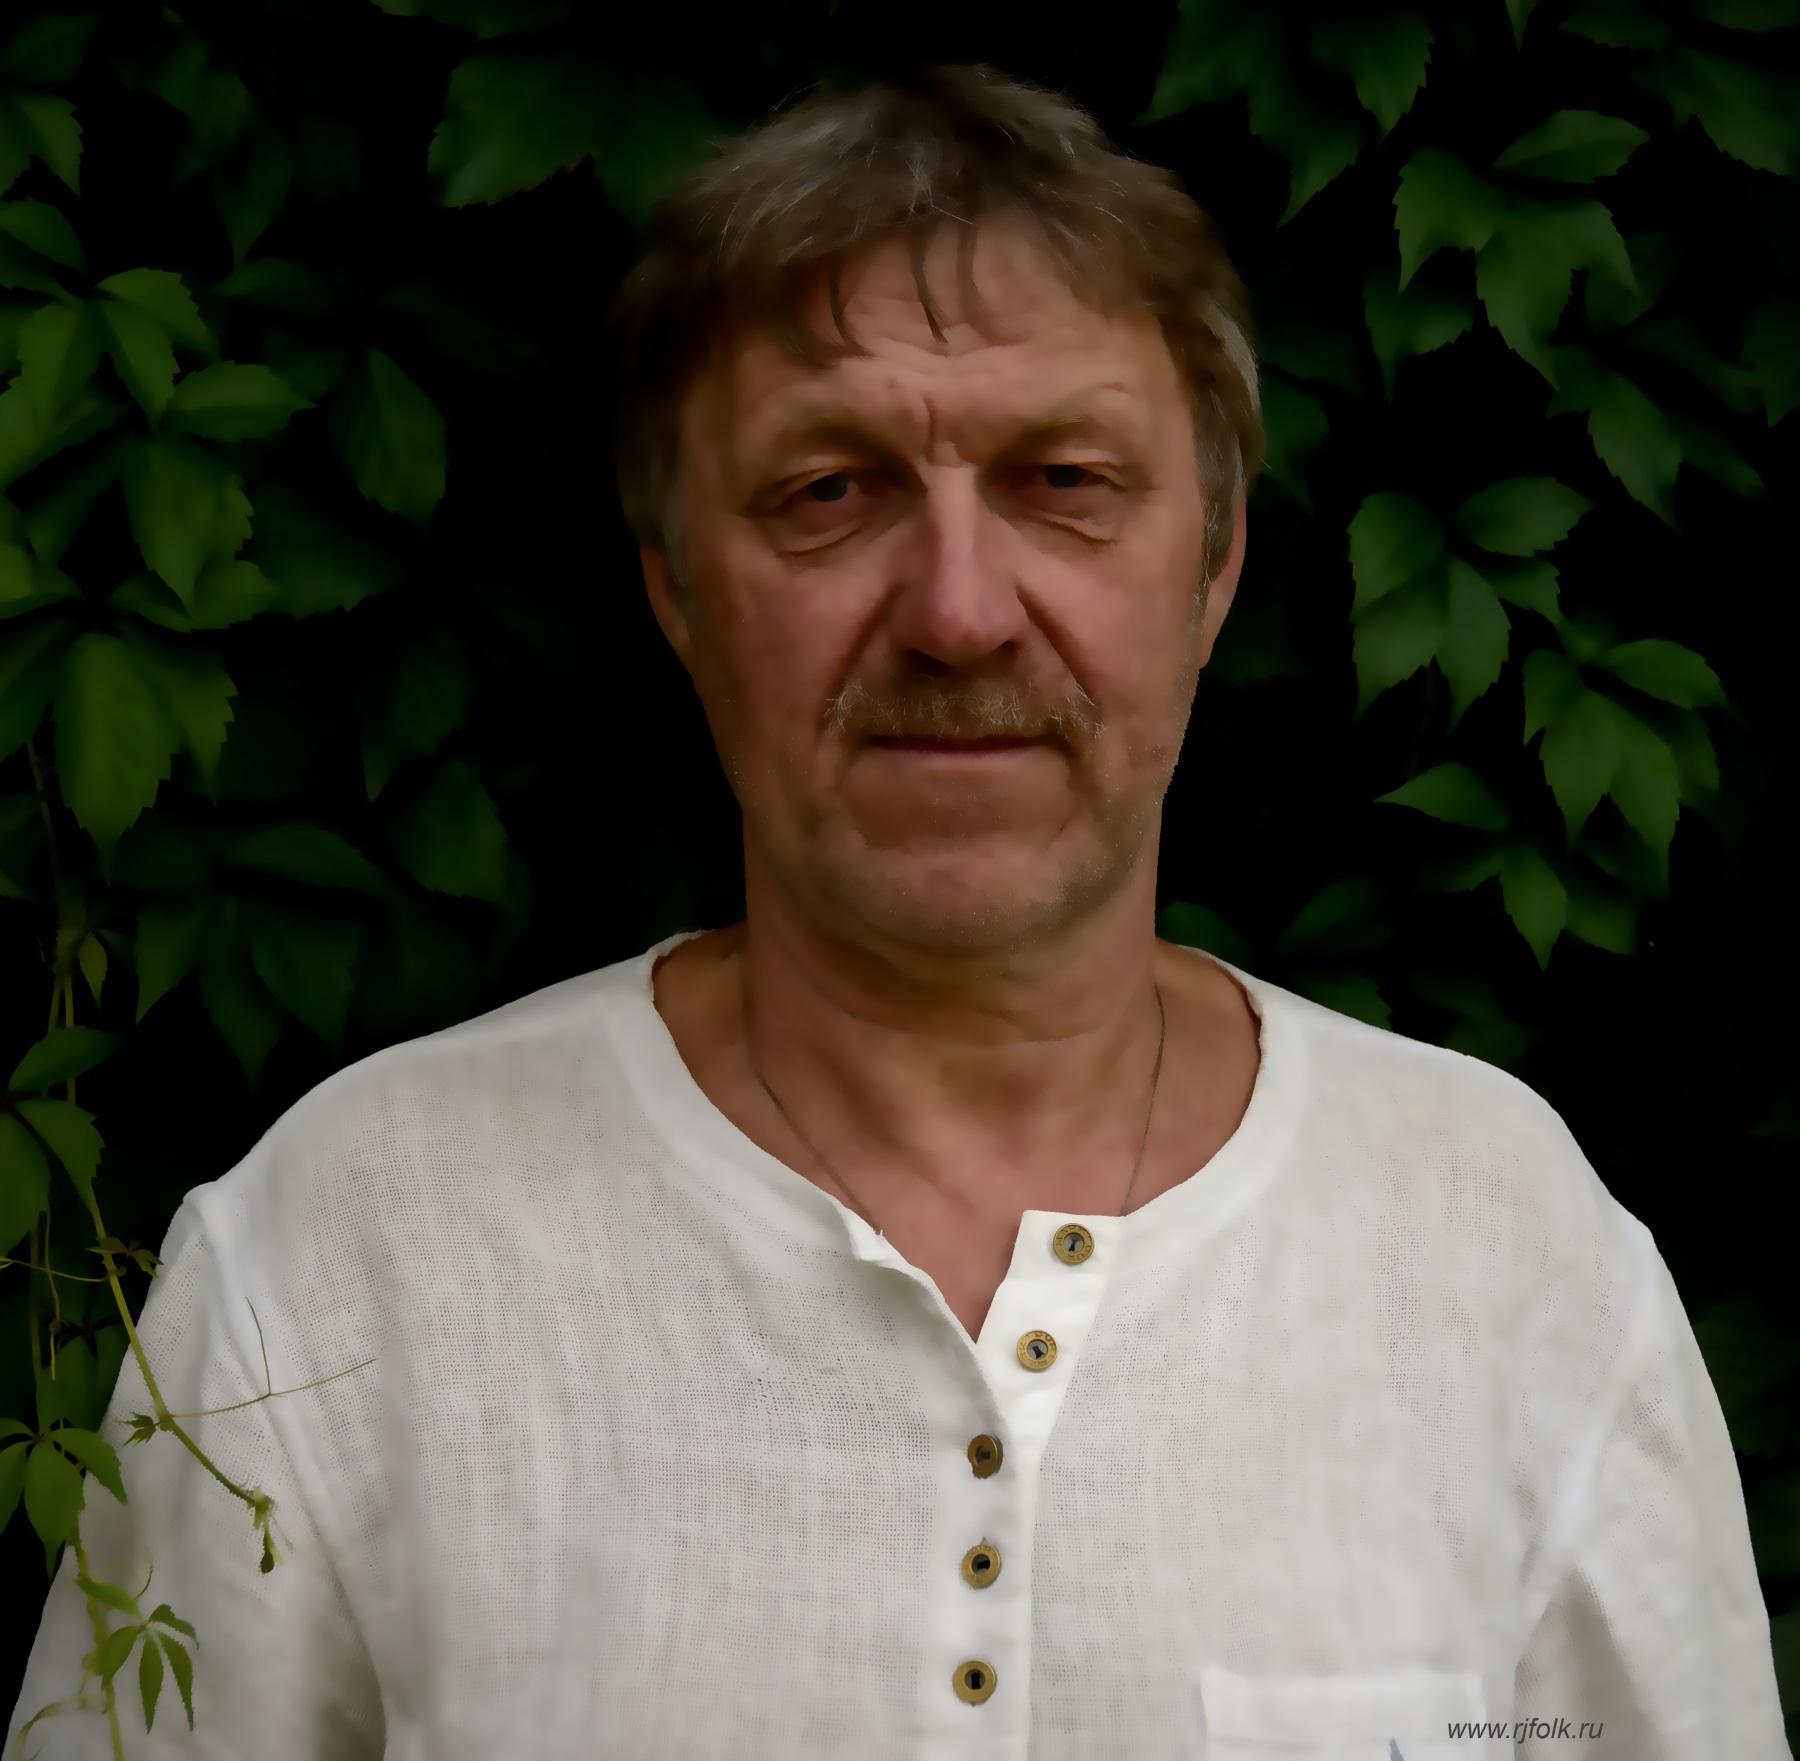 Malkov